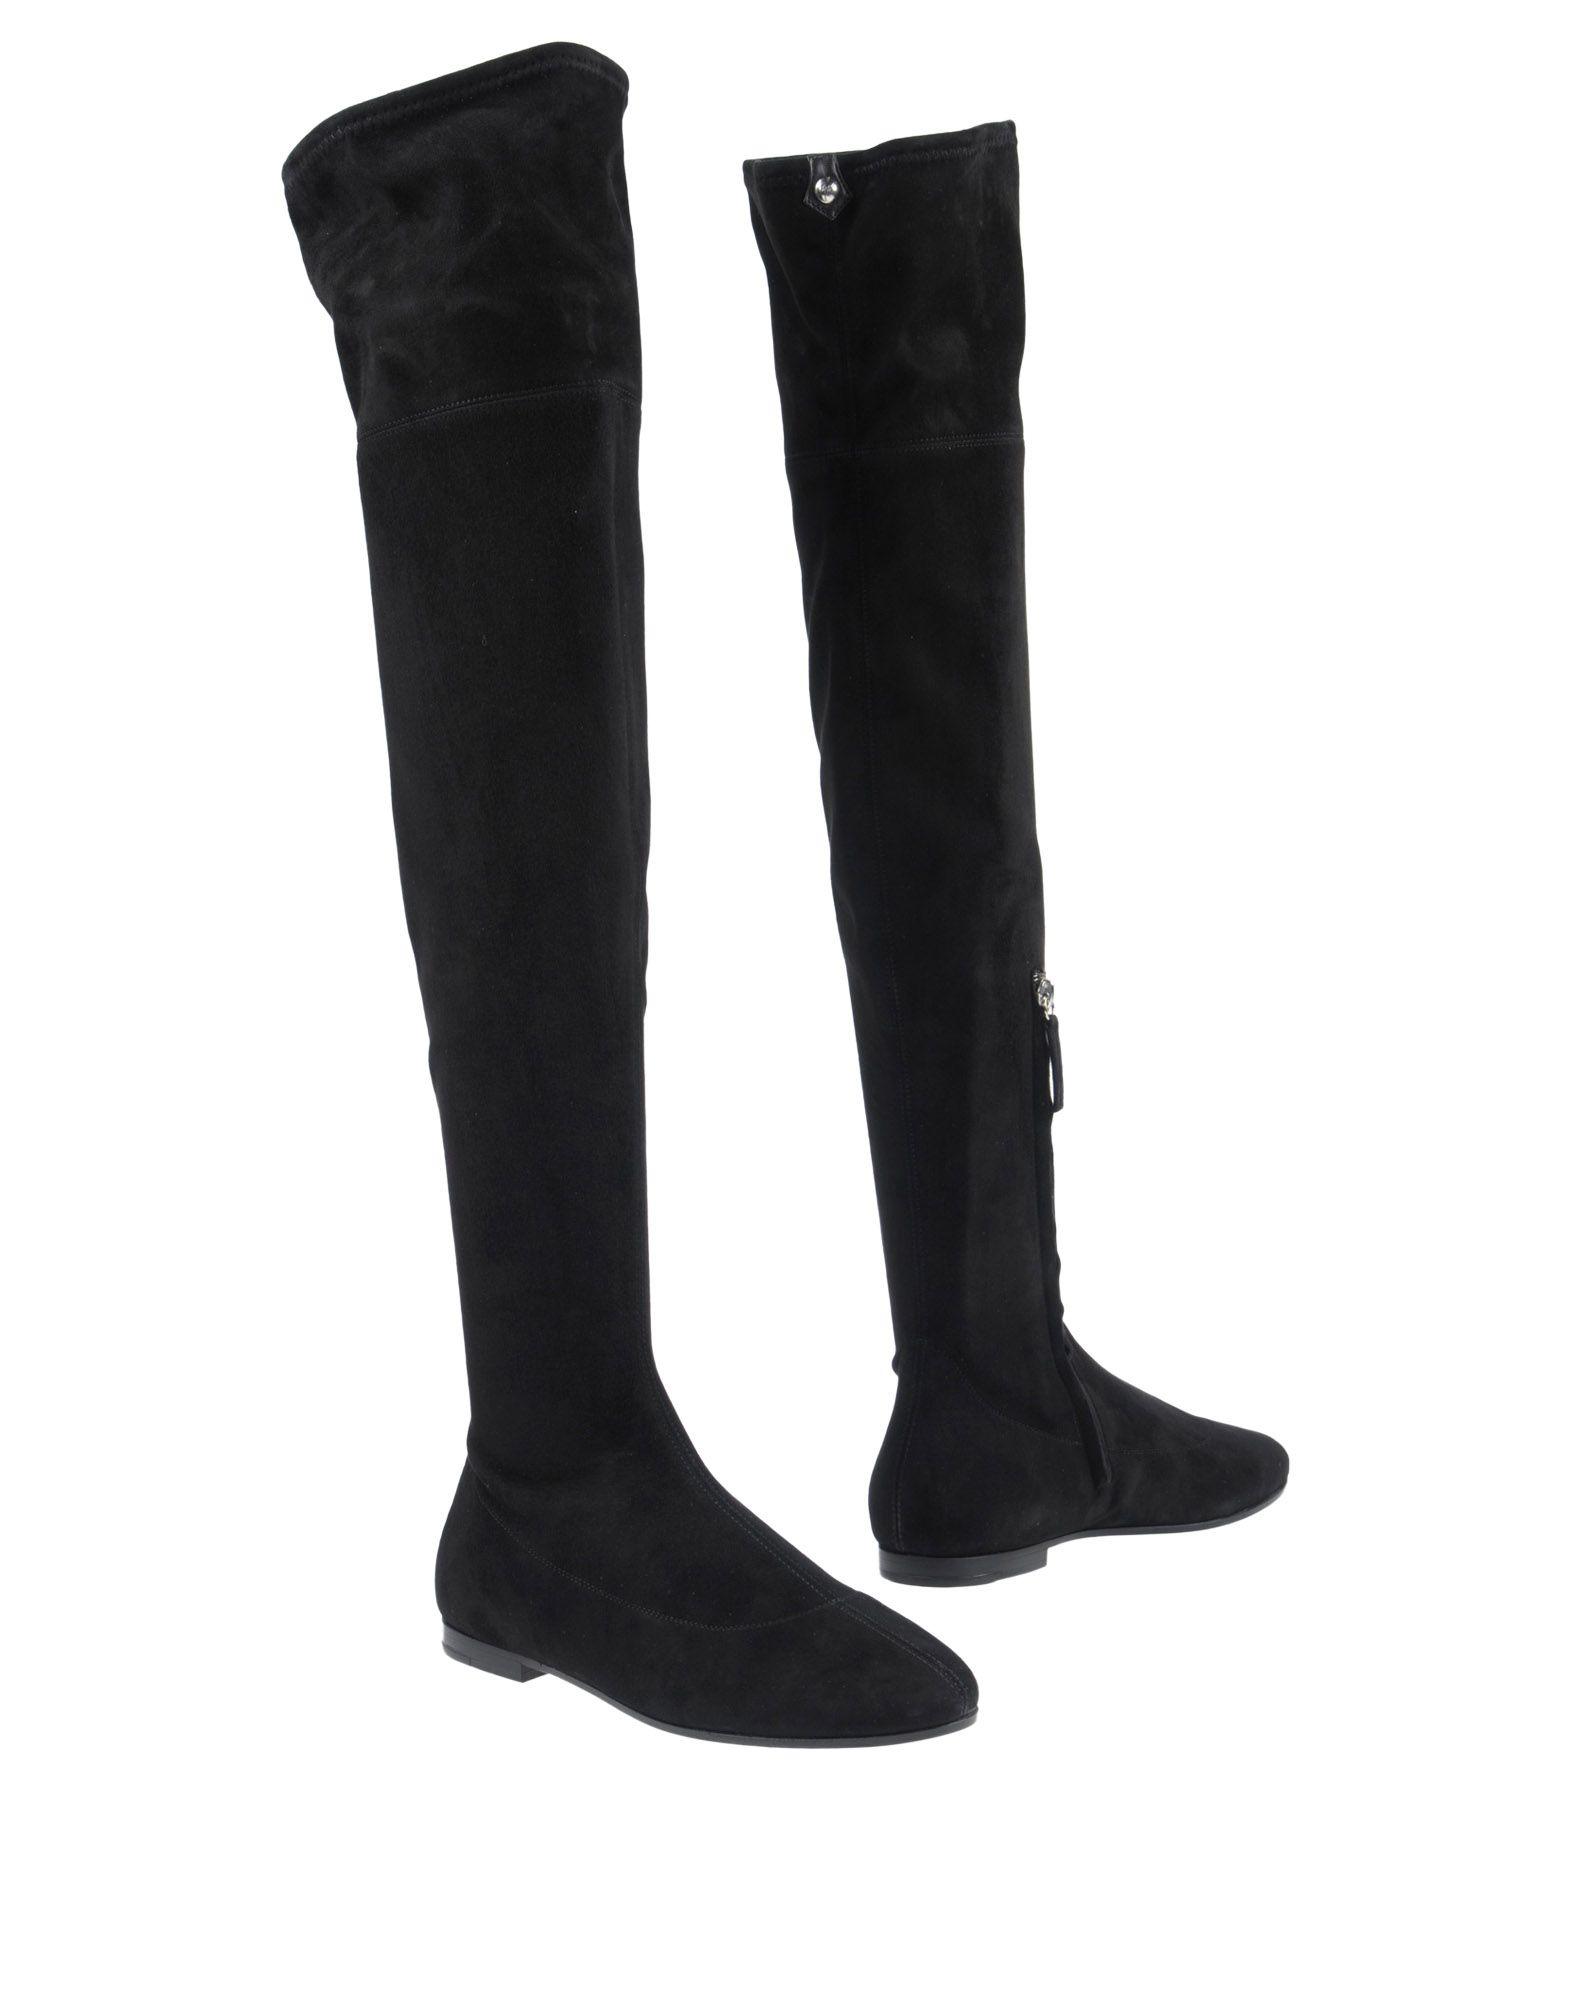 Giuseppe Zanotti Boots - Women Giuseppe  Zanotti Boots online on  Giuseppe Australia - 11445979MR 1c5213